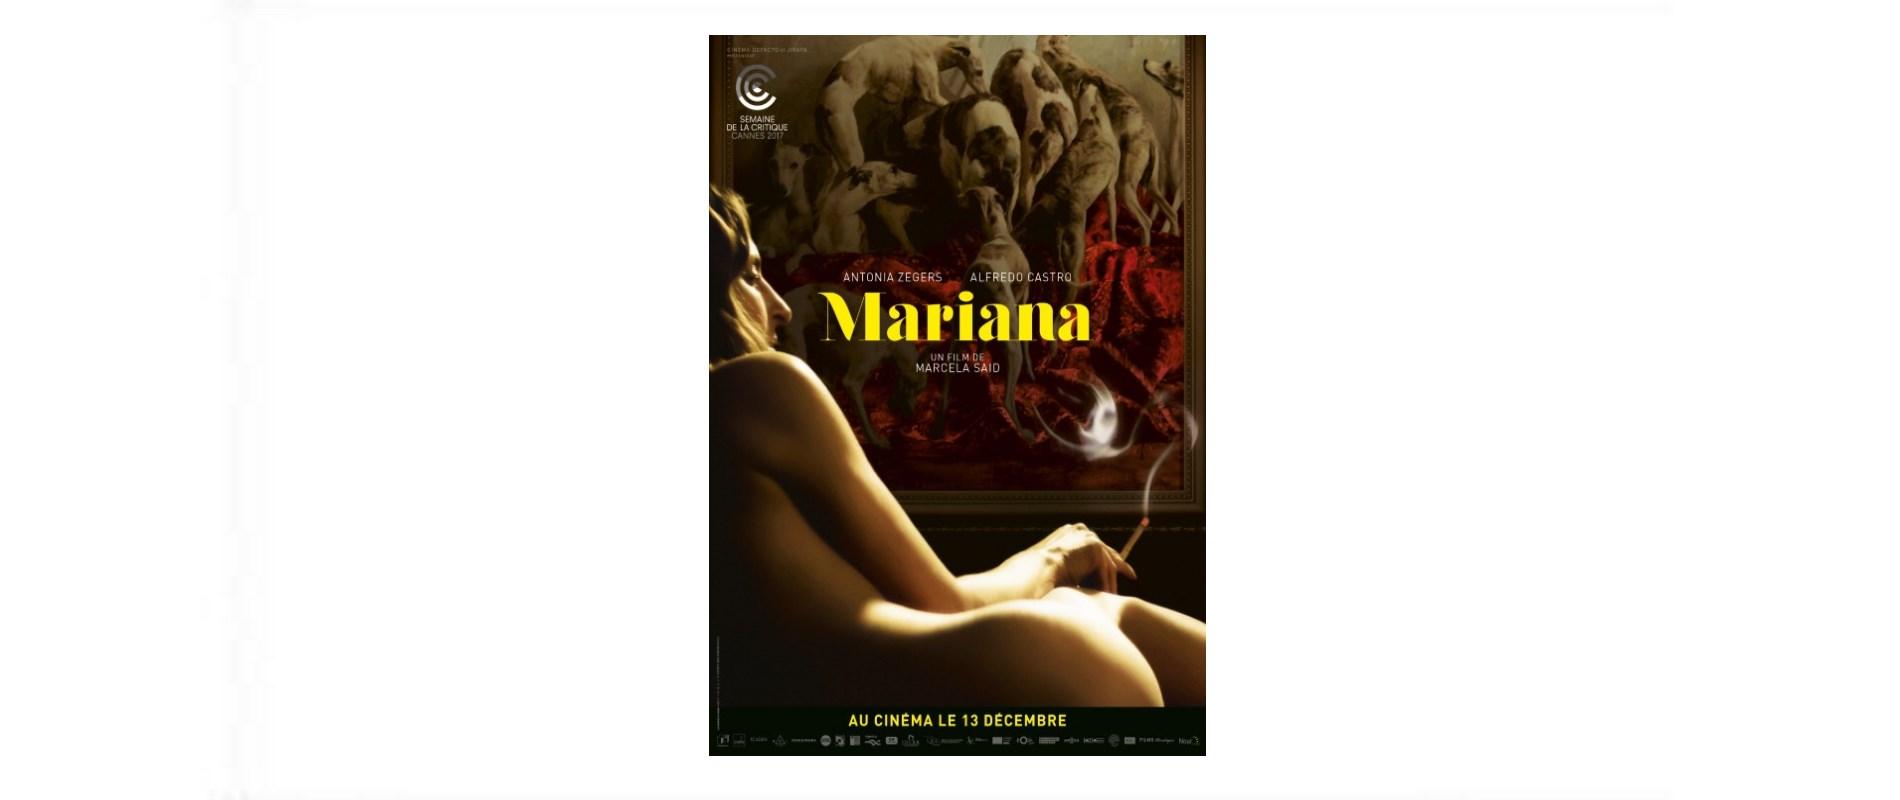 MARIANA-AU CINEMA LE 13 DECEMBRE